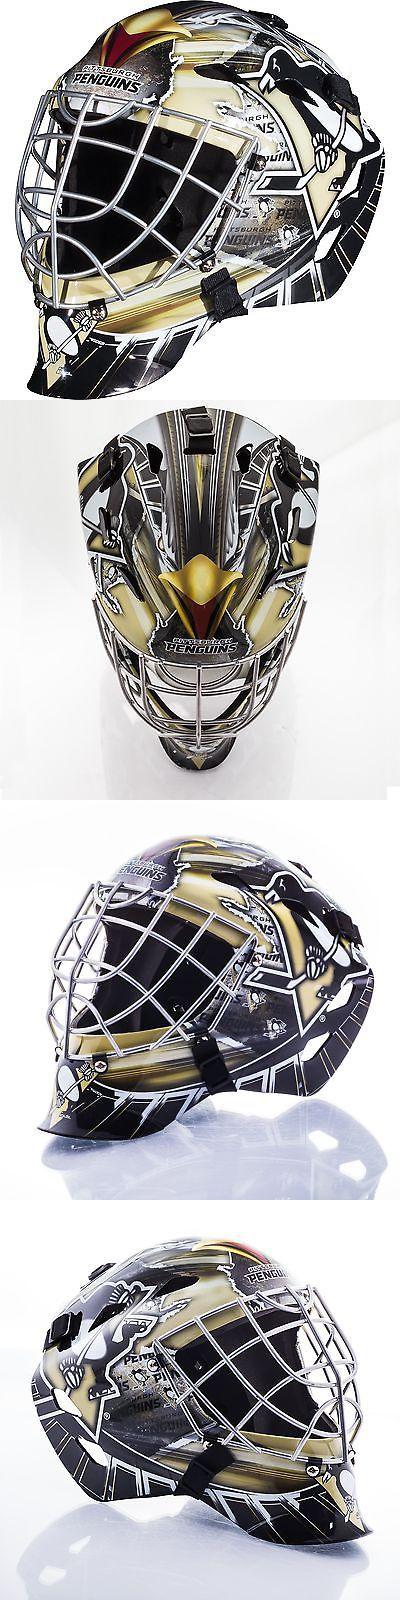 Face Masks 79762: Gfm 1500 Goalie Face Mask Pittsburgh Penguins Protection Chrome Finish Hockey -> BUY IT NOW ONLY: $97.99 on eBay!